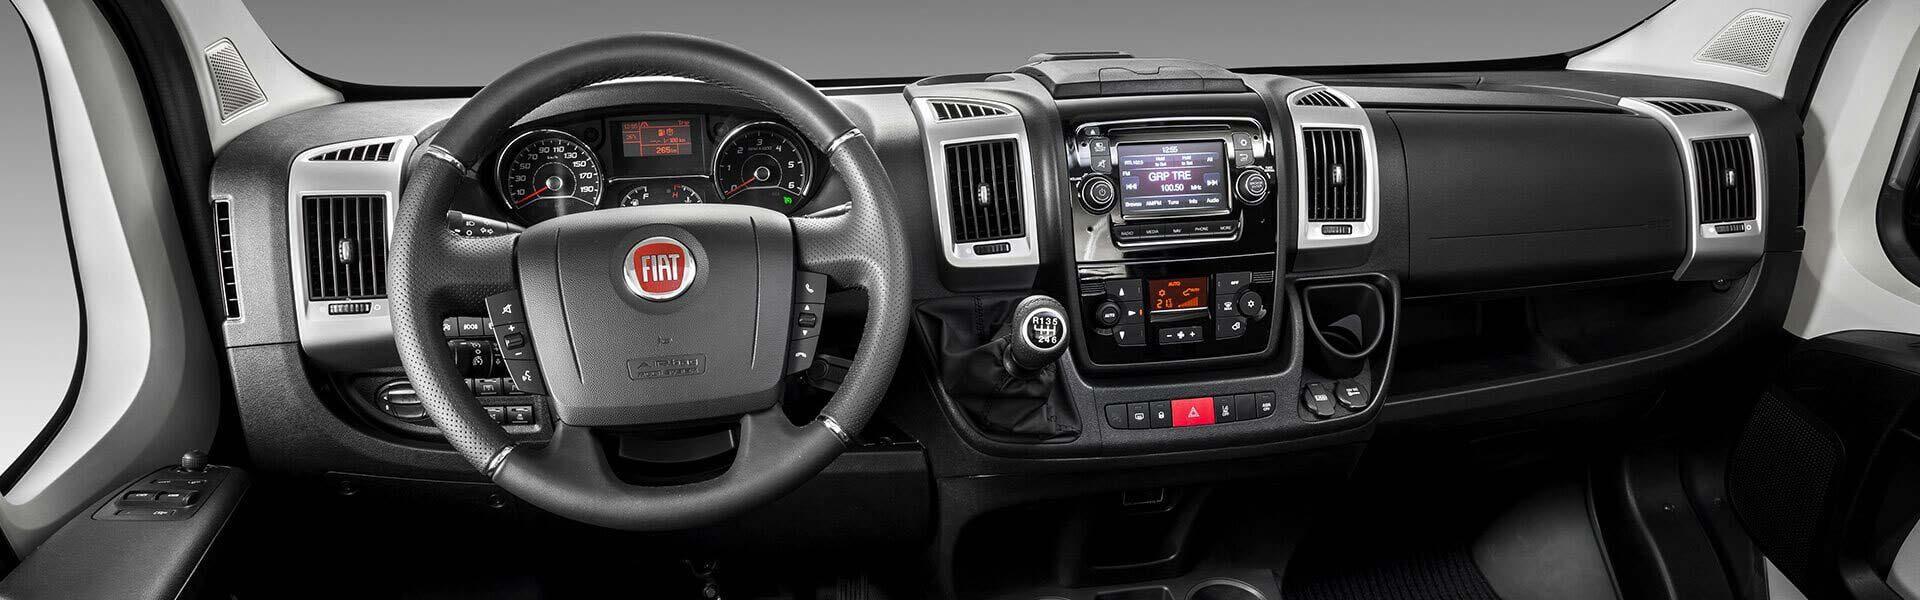 Fiat ducato kombi fiat professional personentransporter for Interieur fiat ducato 2000